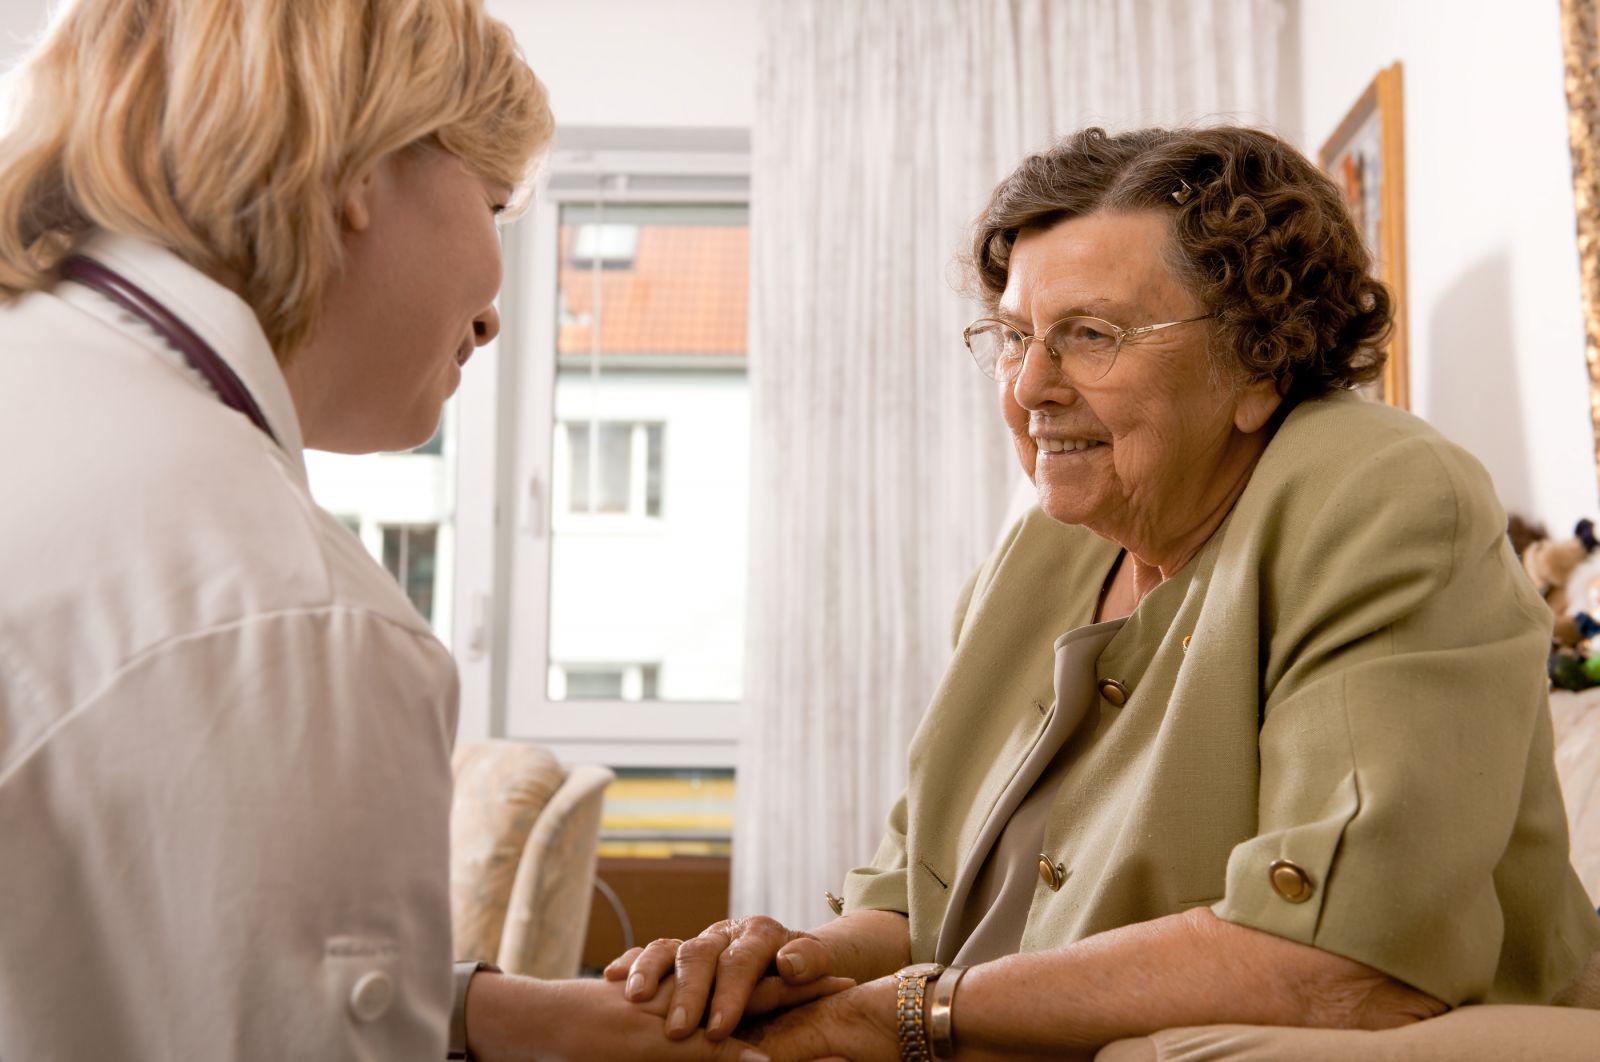 geriatric-care manager